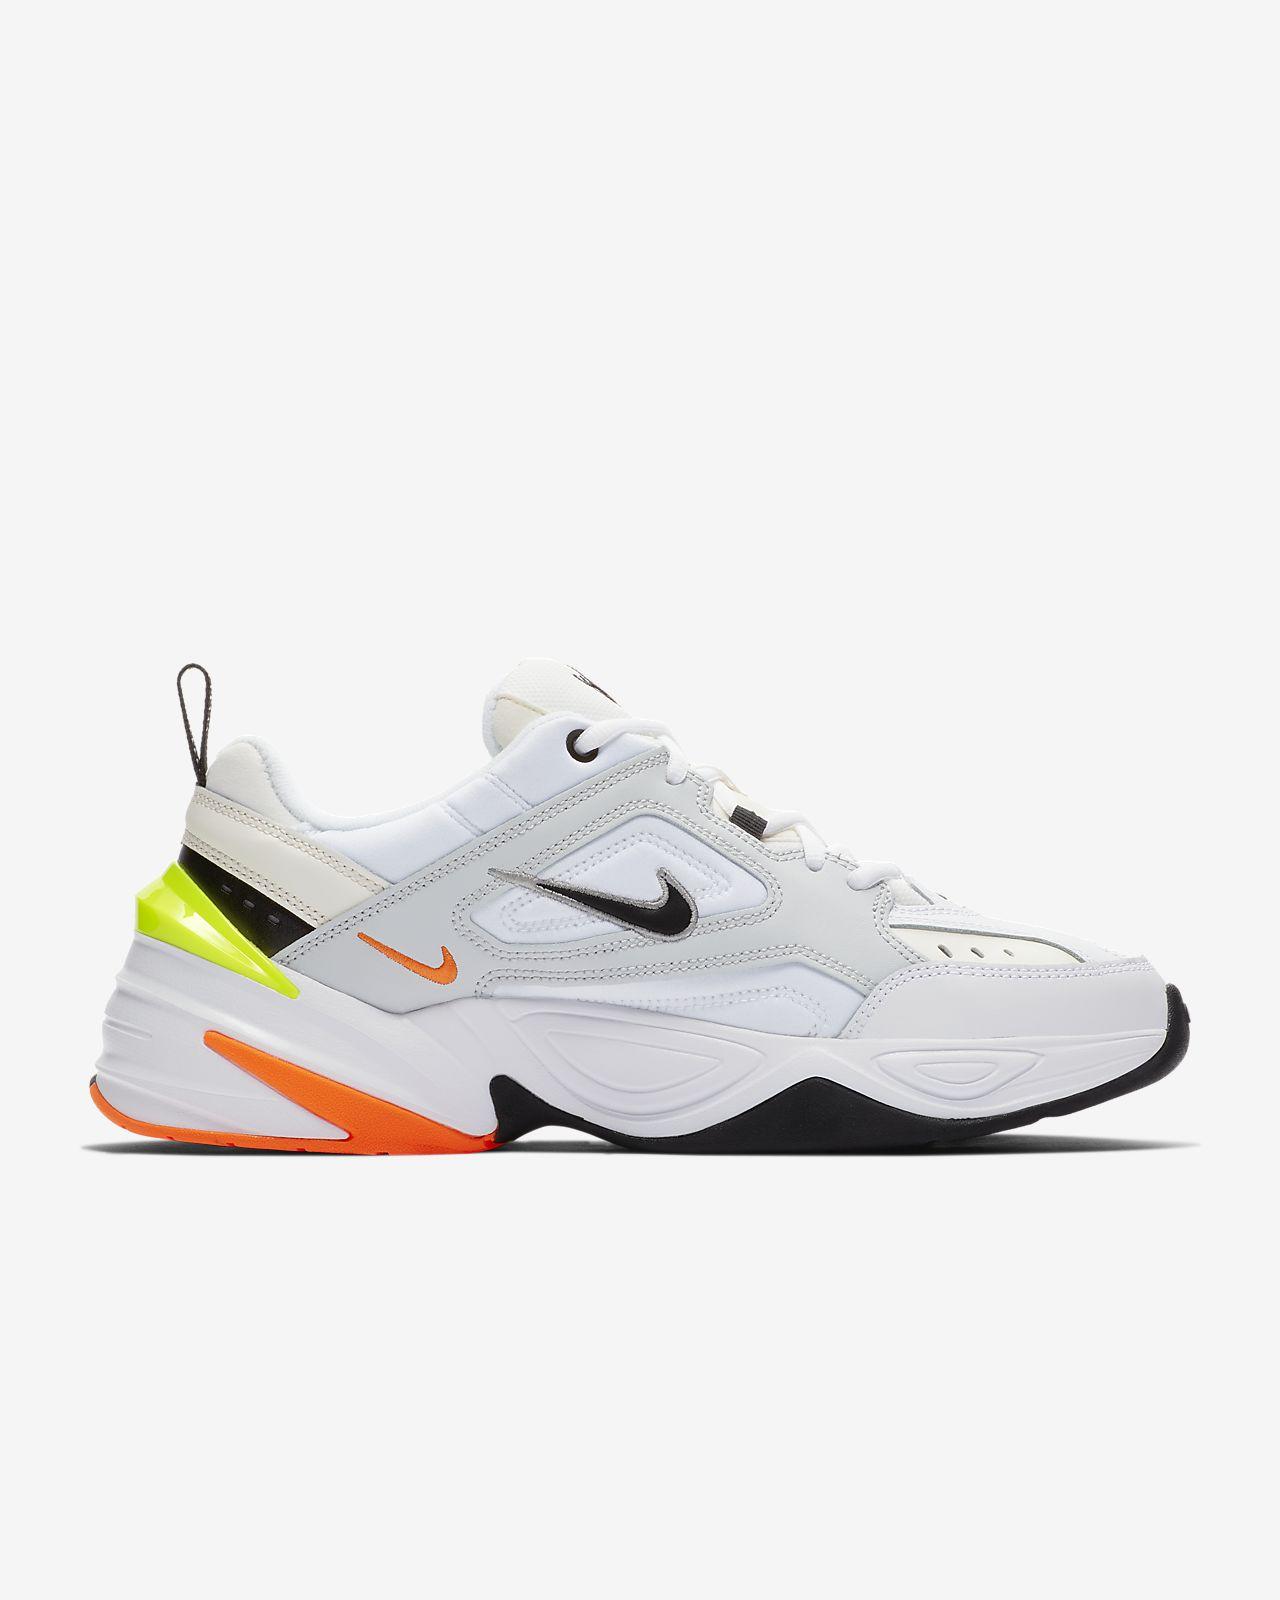 release date d62f2 0a6c0 ... Nike M2K Tekno Men s Shoe